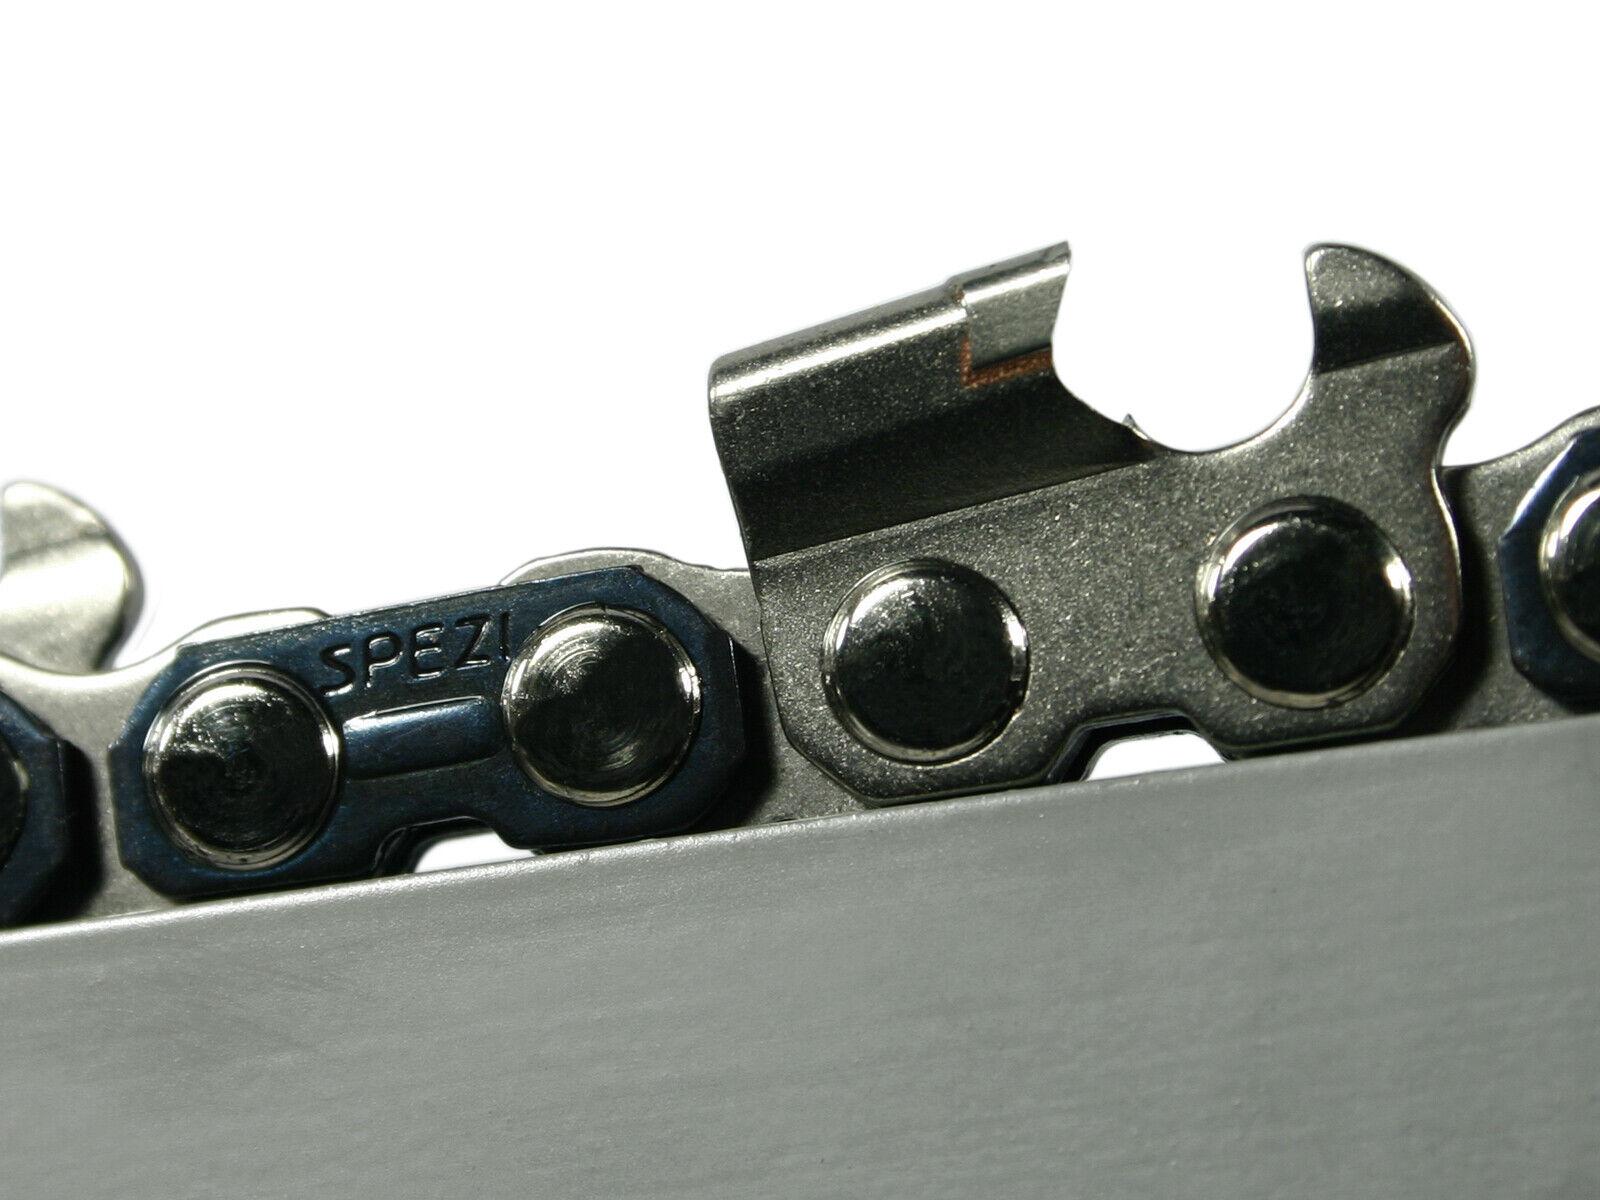 Metal duro para sierra cadena compatible con still 038 Av MS 380 75 cm 3 8  98tg 1,6mm Chain